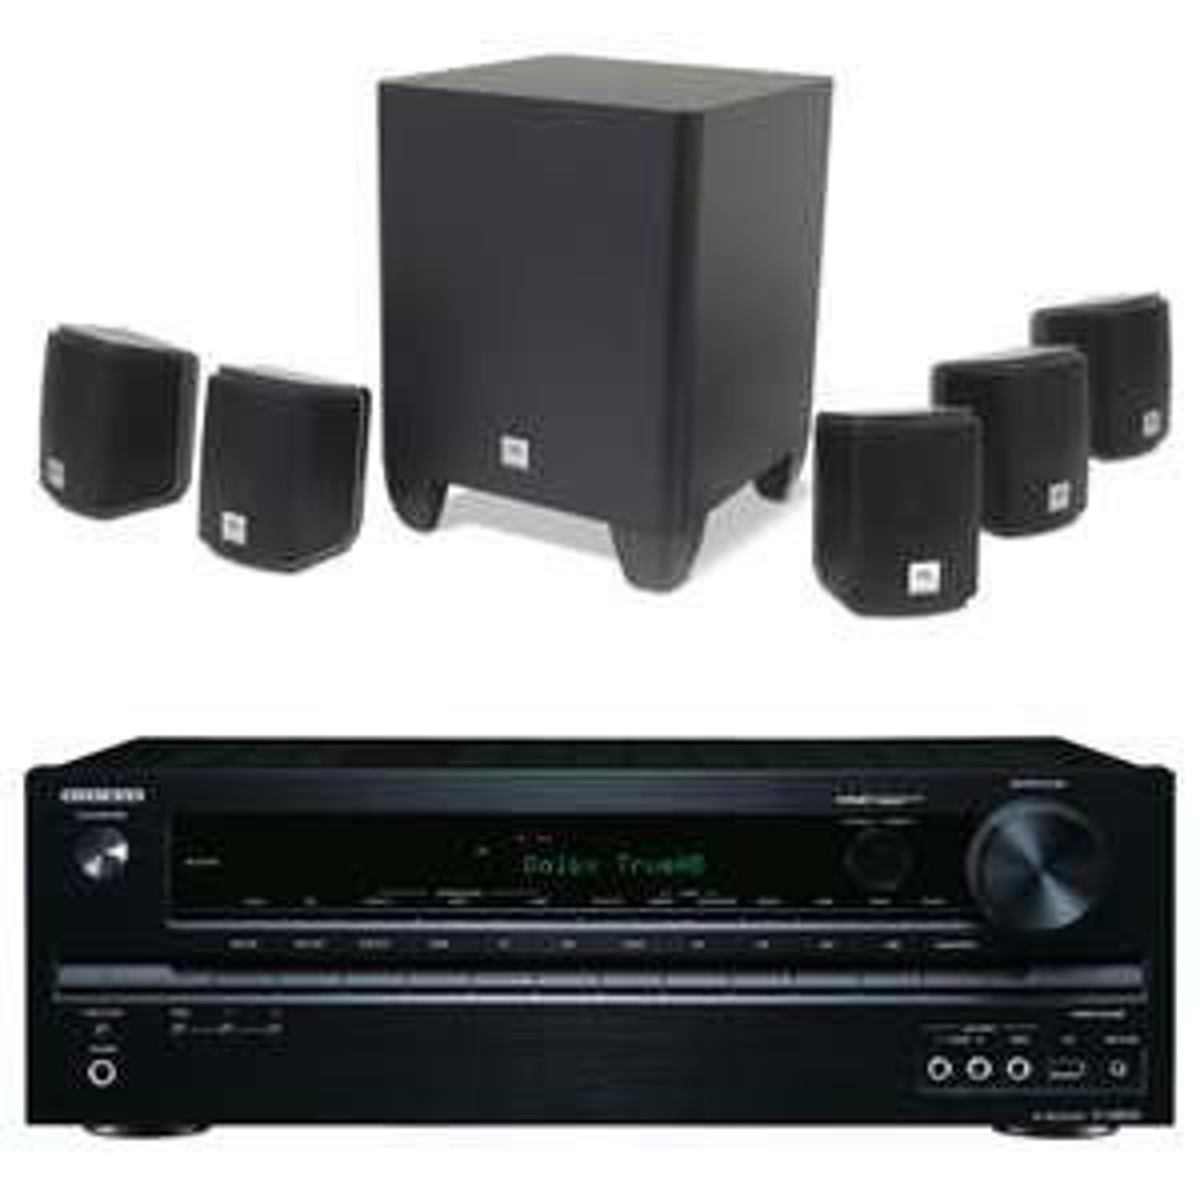 Ampli home-cinéma 5.2  Onkyo TX-NR535 Noir + Pack d'enceintes compactes 5.1 JBL Cinema 510